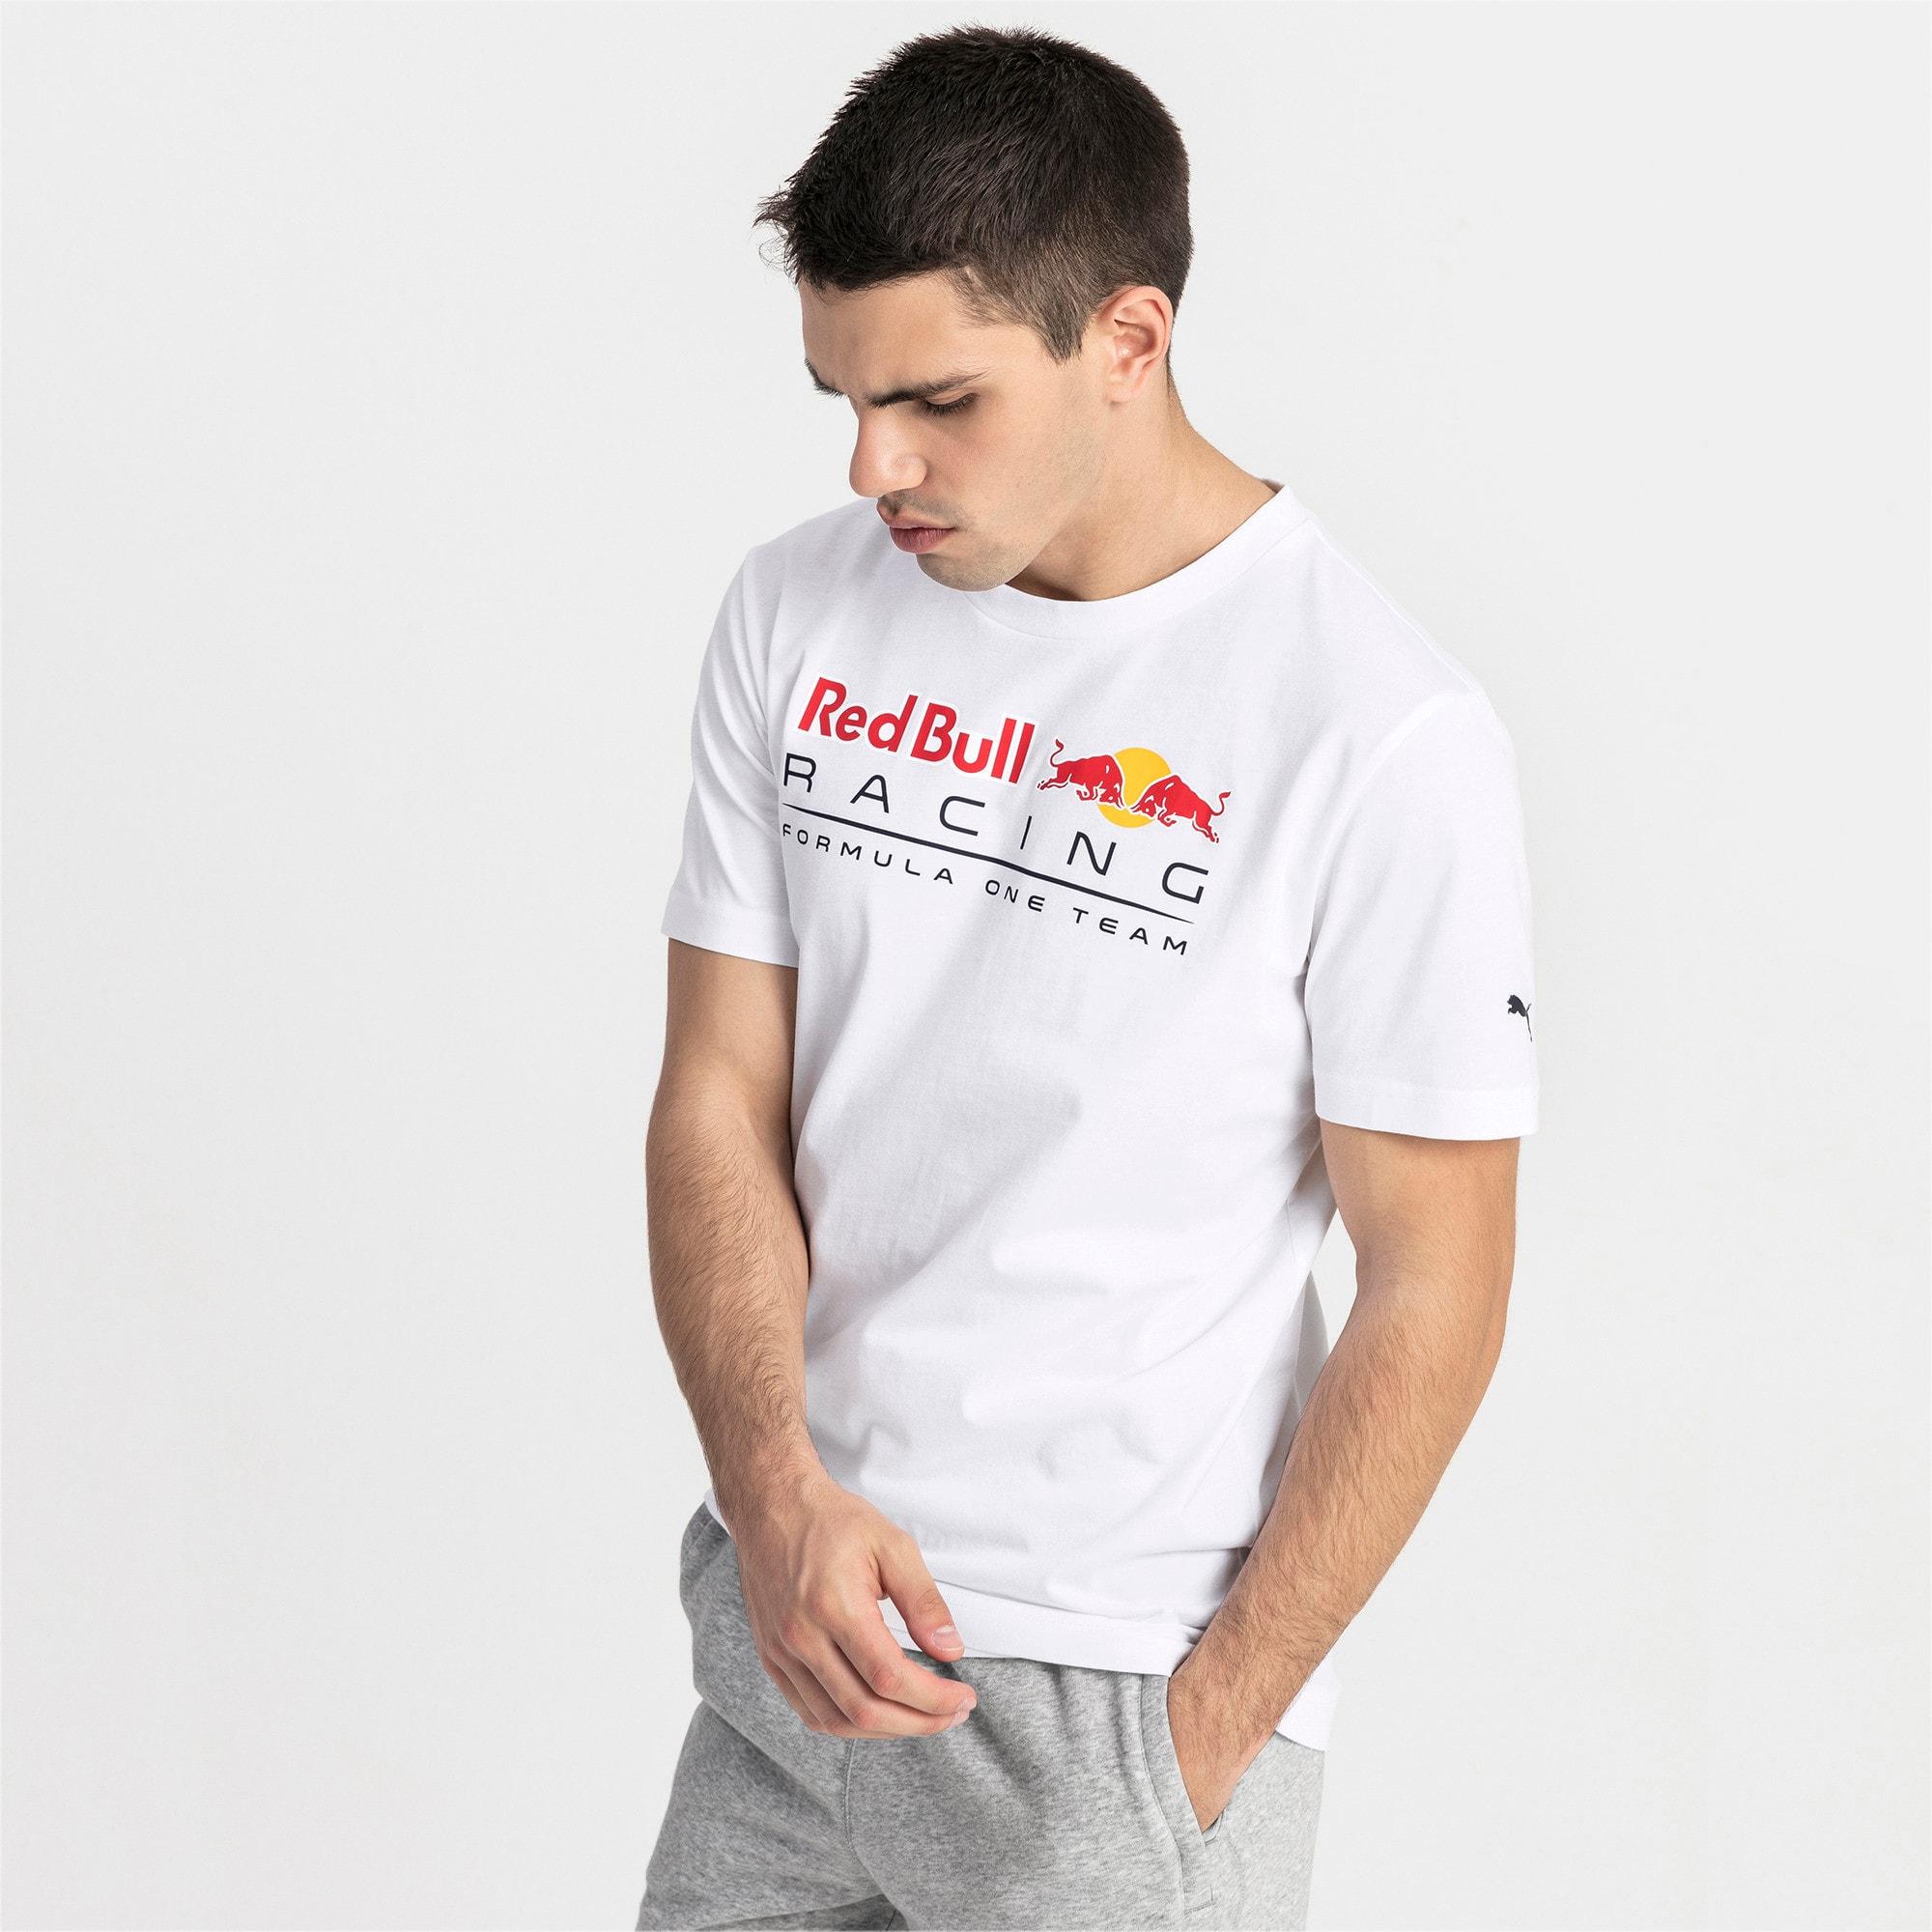 Thumbnail 1 of Red Bull Racing Logo Men's Tee, Puma White, medium